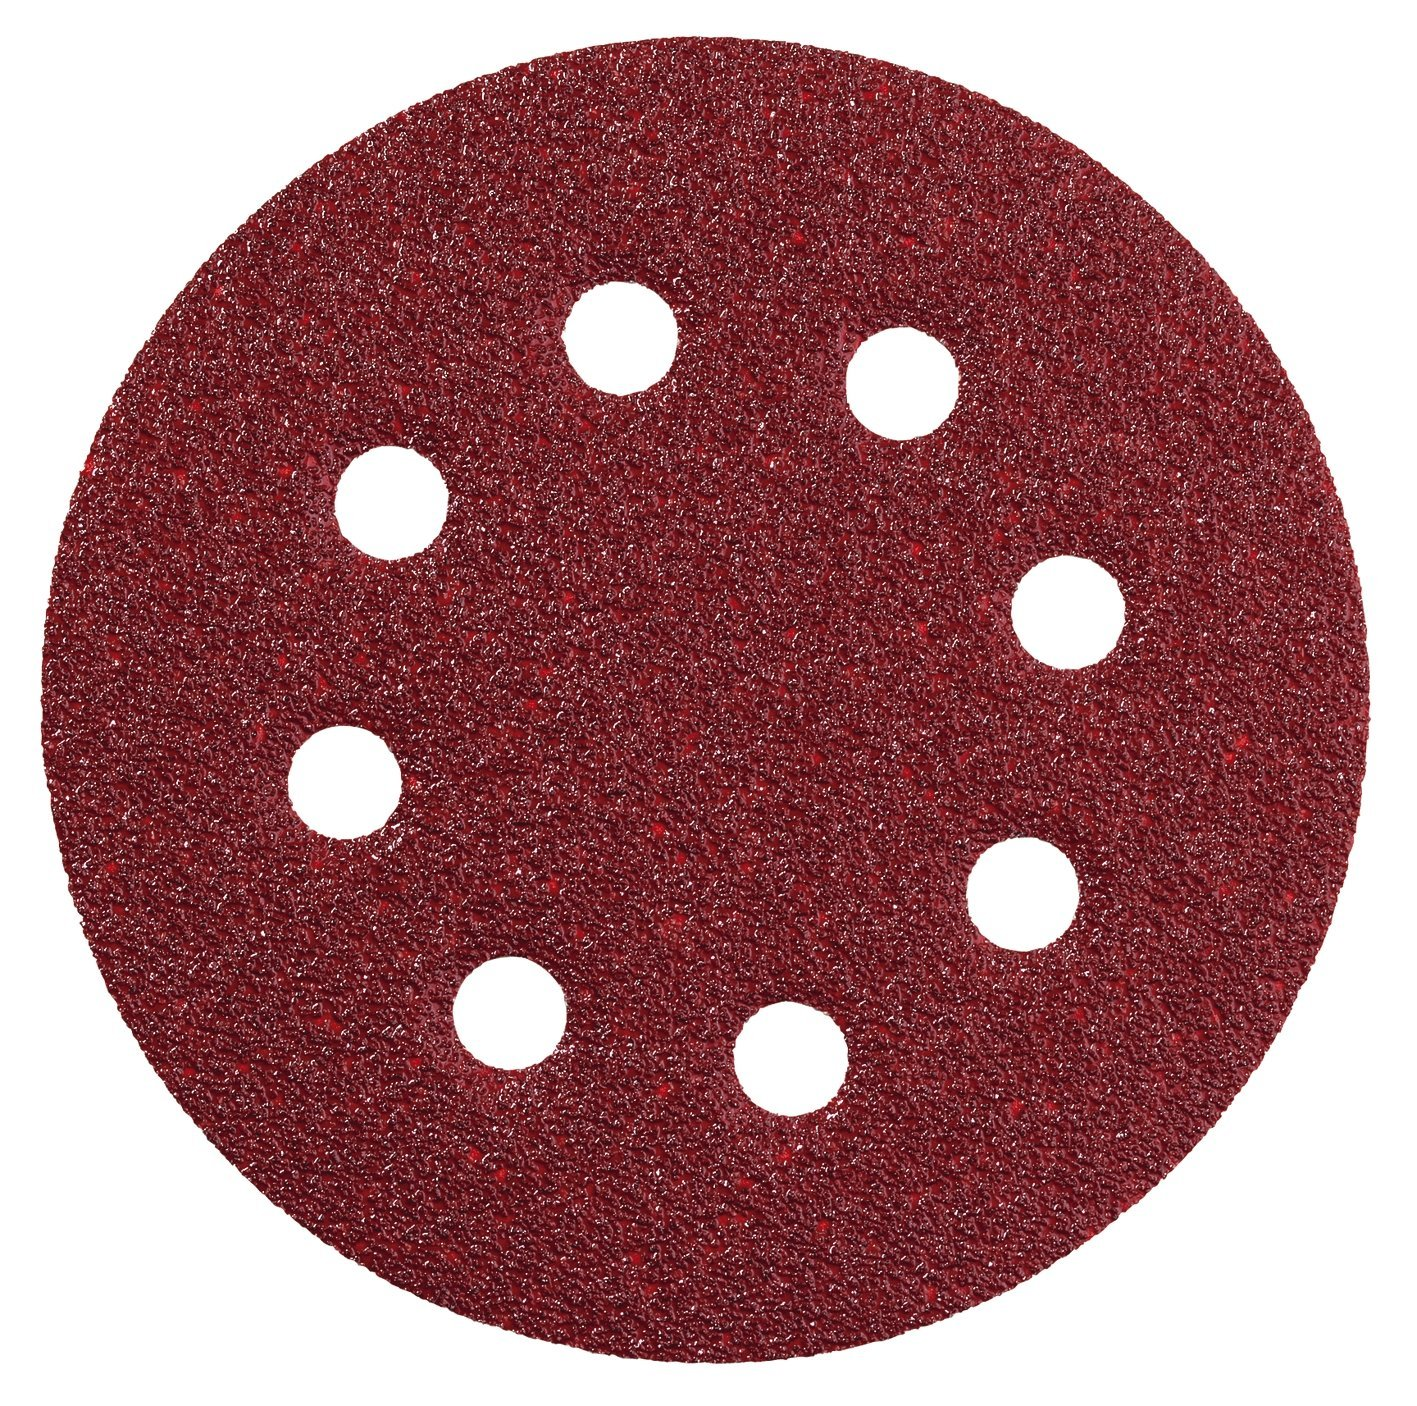 Metabo Cumi 5 Sanding Discs 125mm – P 80